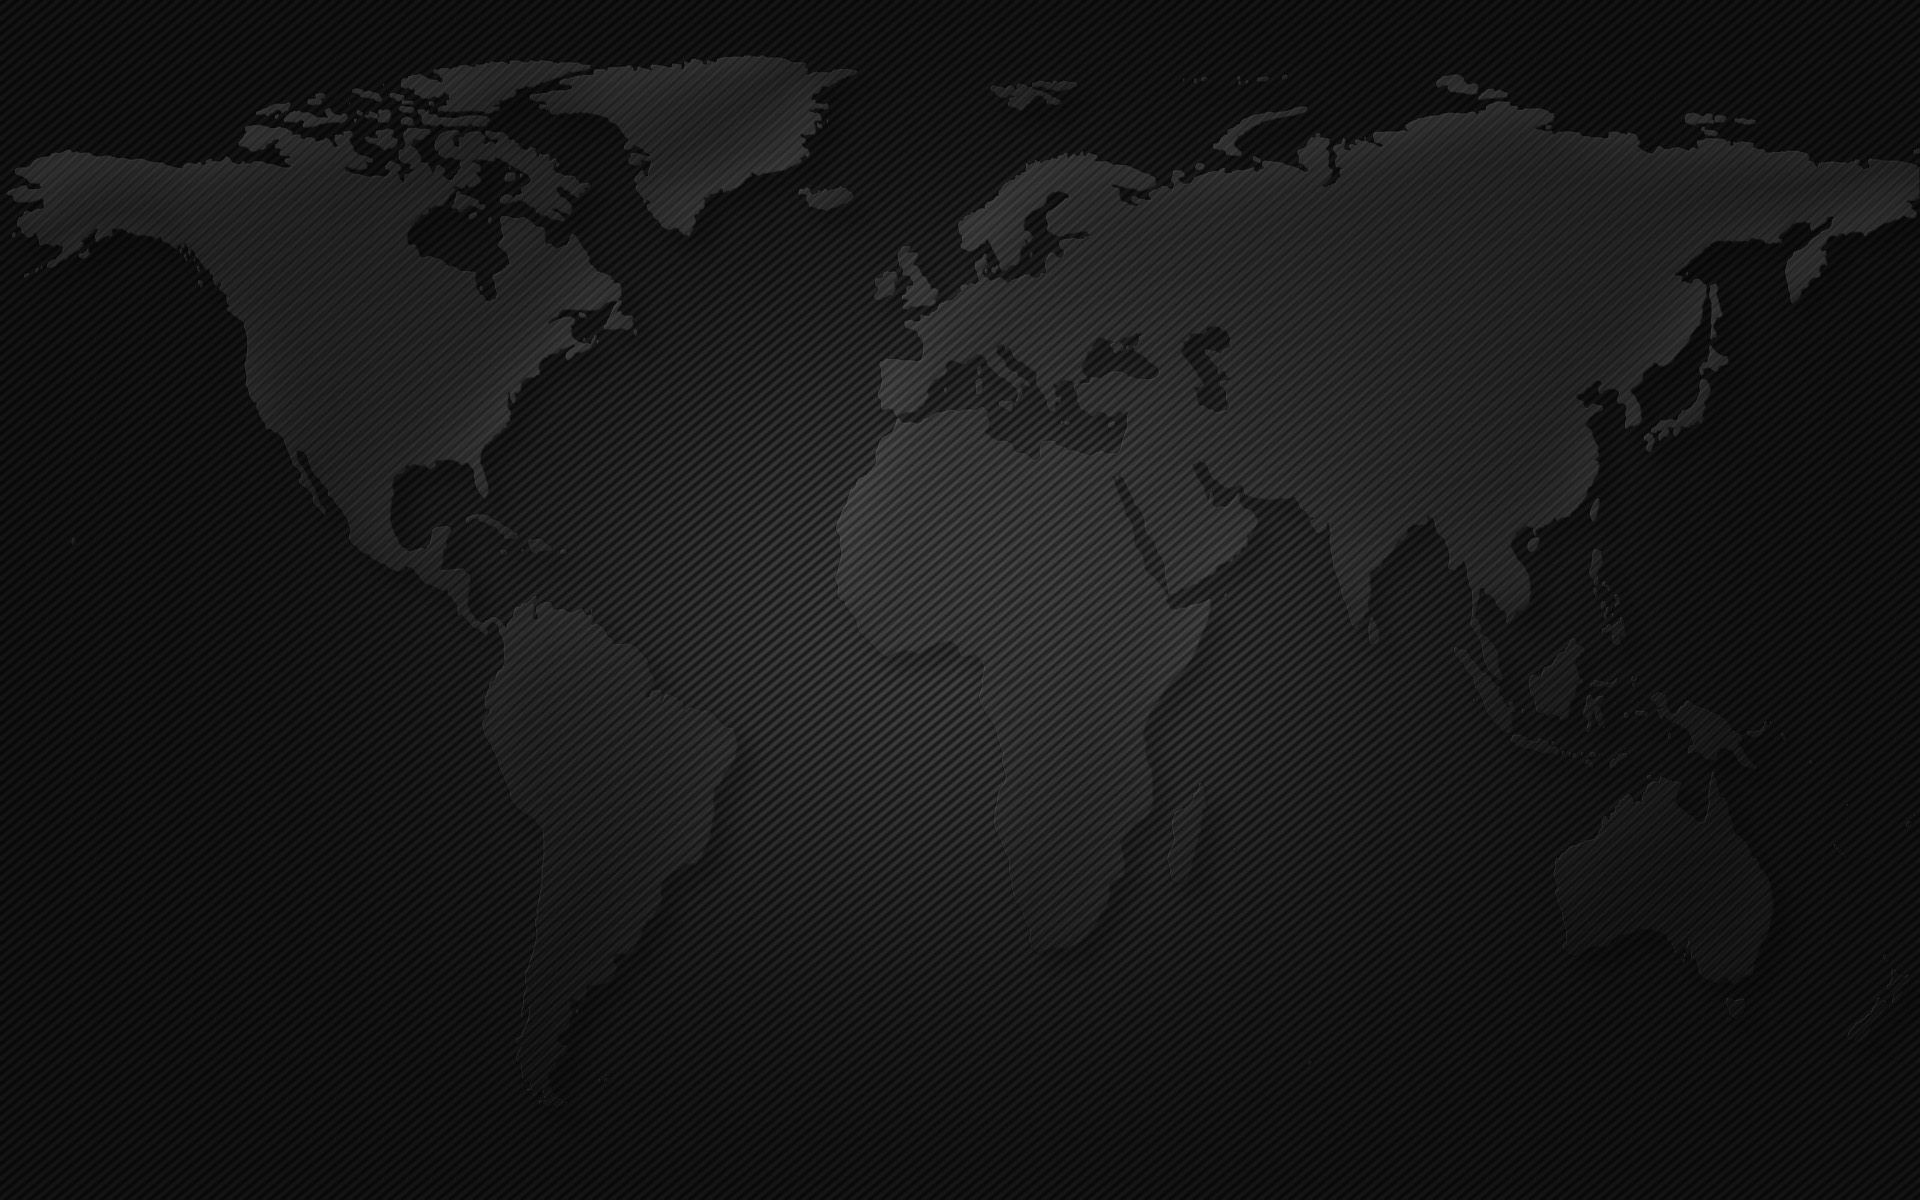 World Map Background Download Free Stunning High Resolution